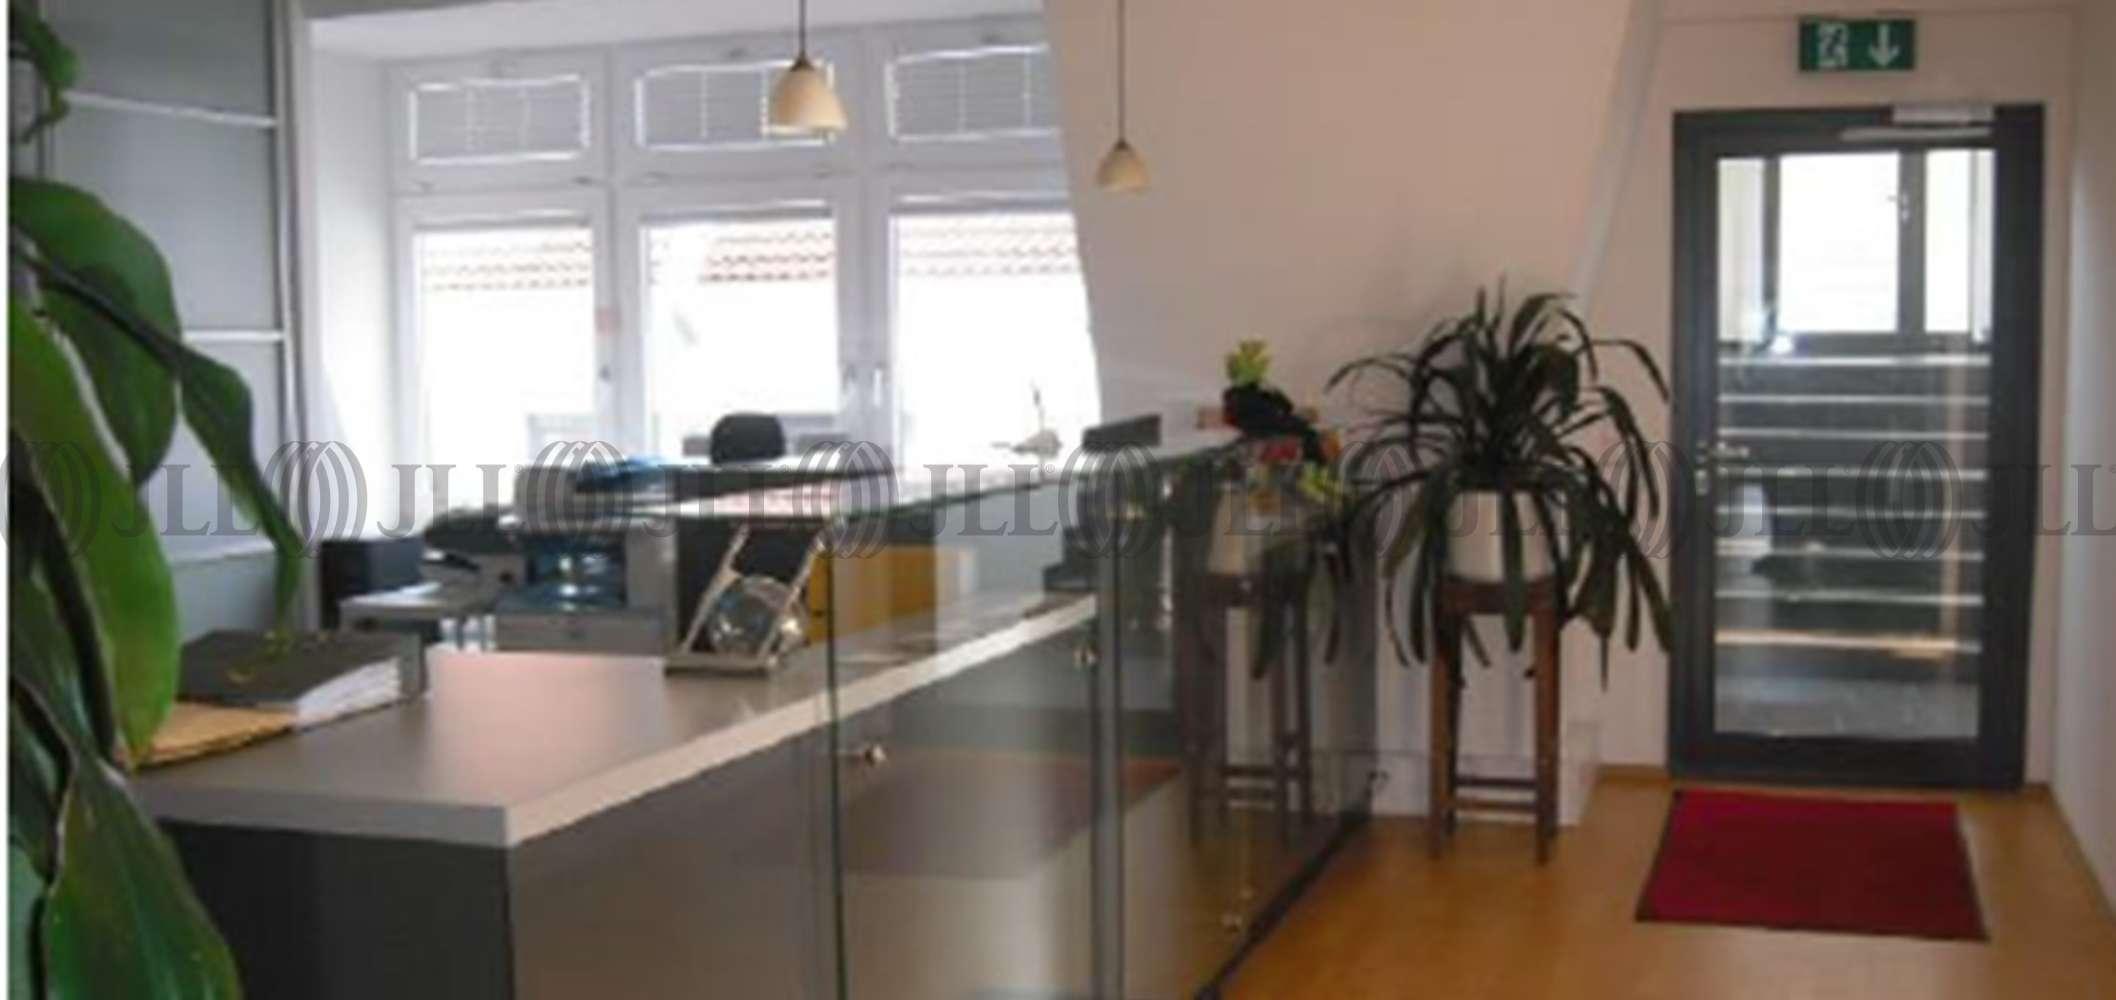 Büros Hamburg, 20459 - Büro - Hamburg, Altstadt - H0496 - 9409455